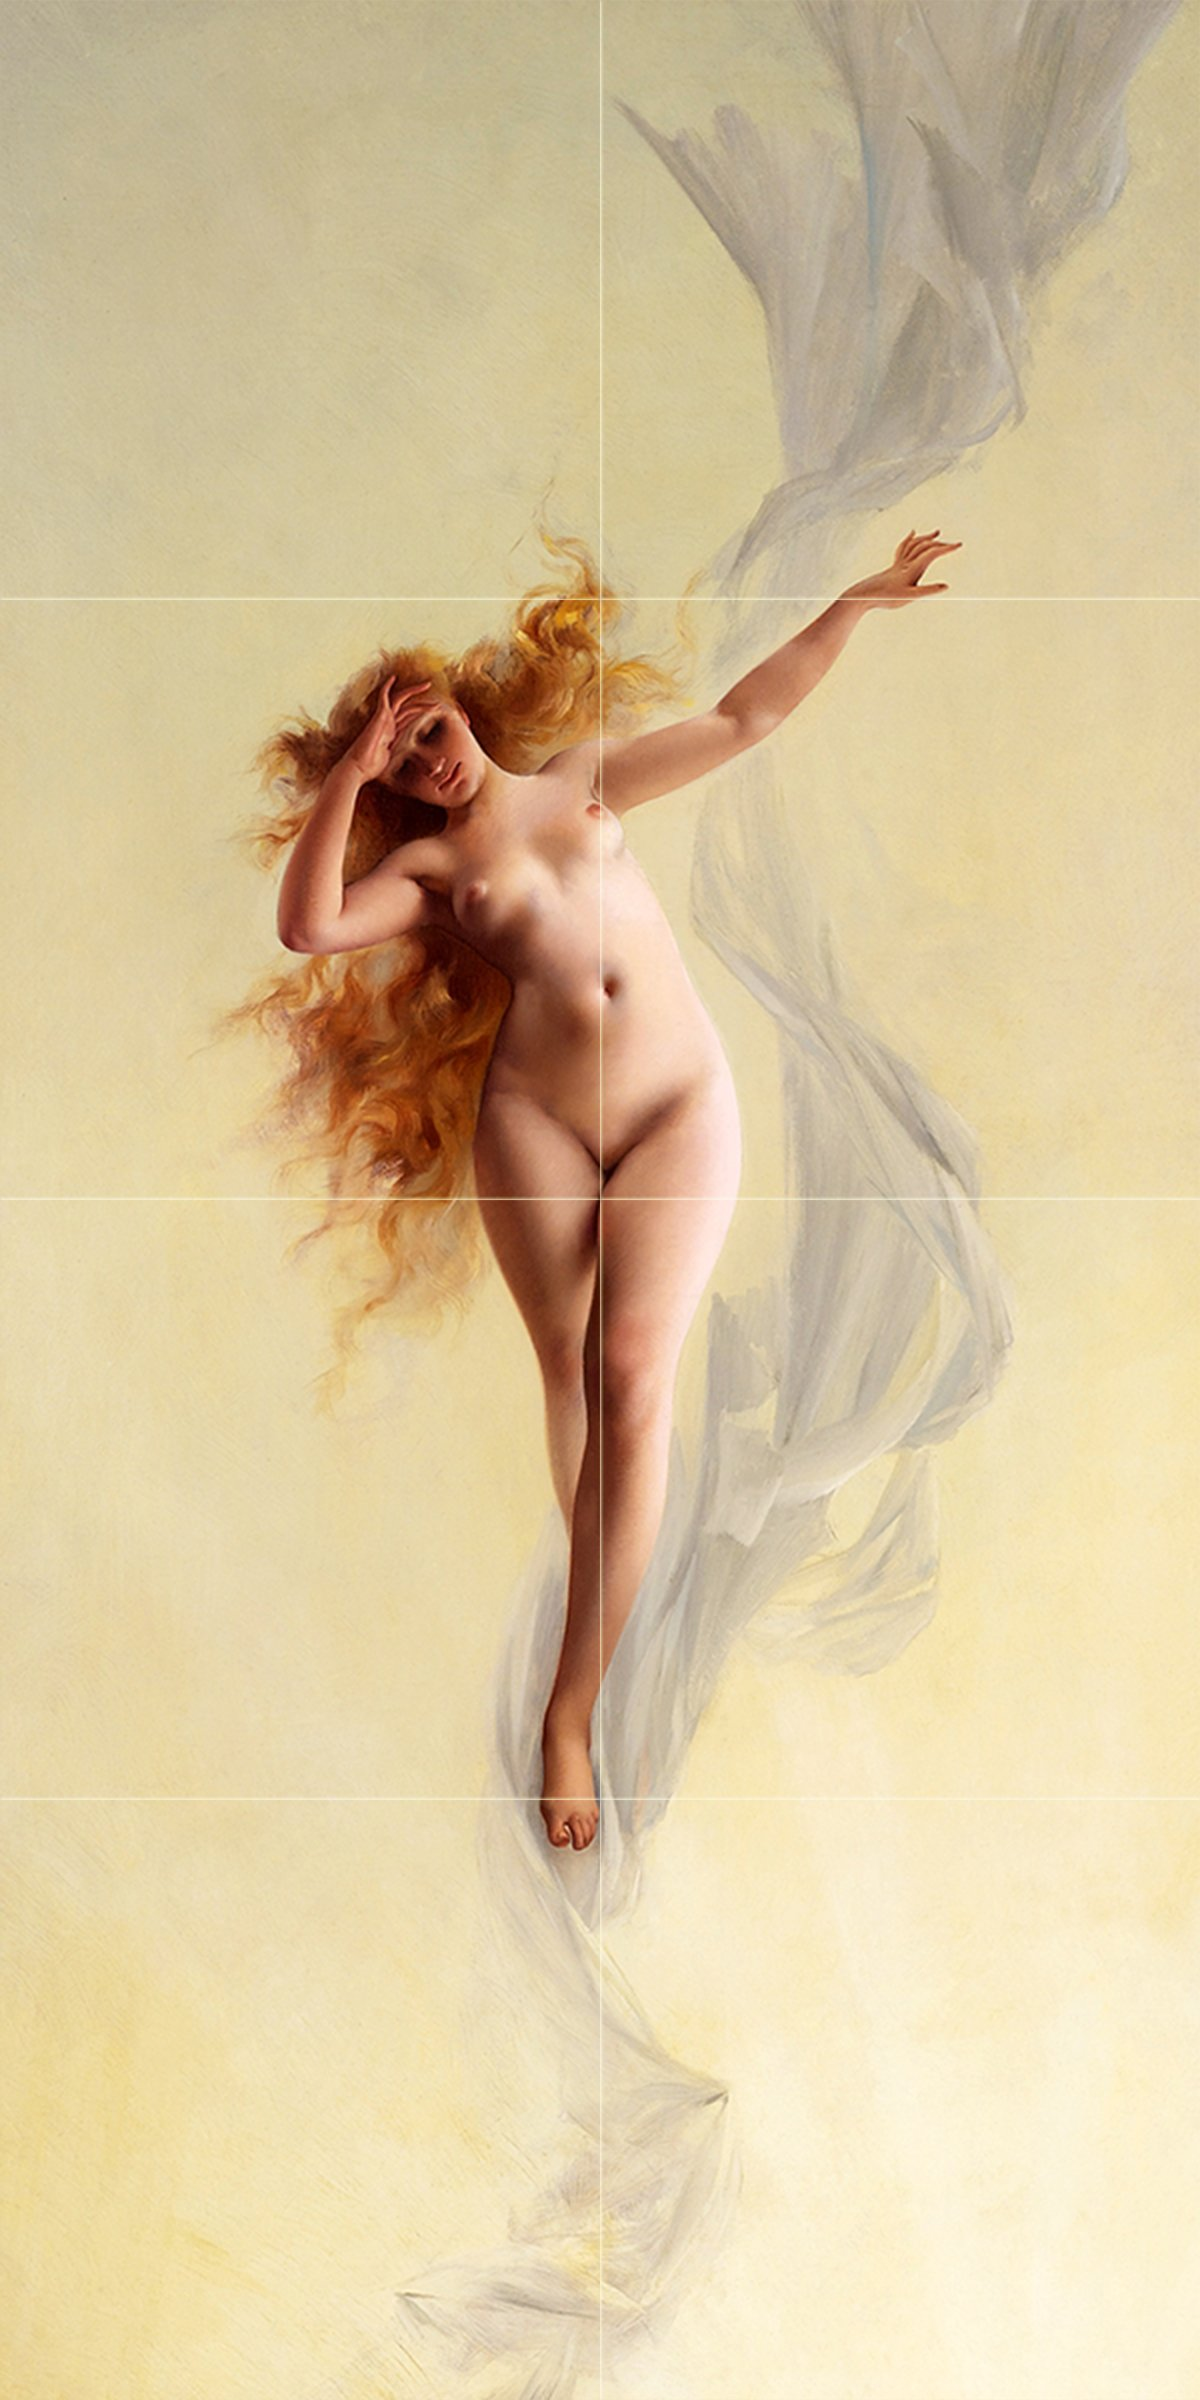 Tile Mural DAWN by Luis Ricardo Falero girl nude woman Kitchen Bathroom Shower Wall Backsplash Splashback 2x4 6'' Rialto